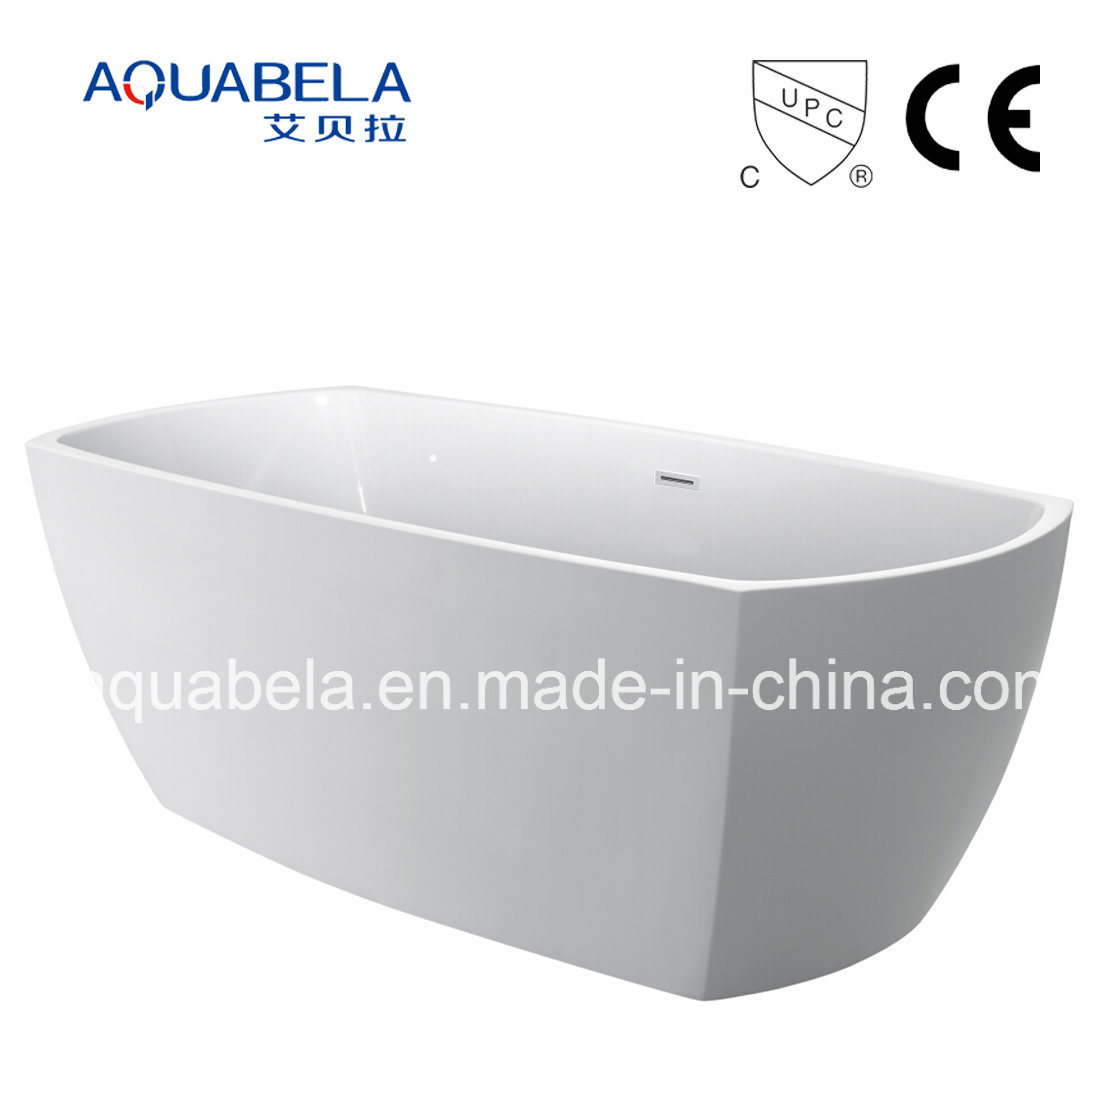 2017 New Ce/Cupc Acrylic Seamless Sanitary Ware Bath Tub (JL655)